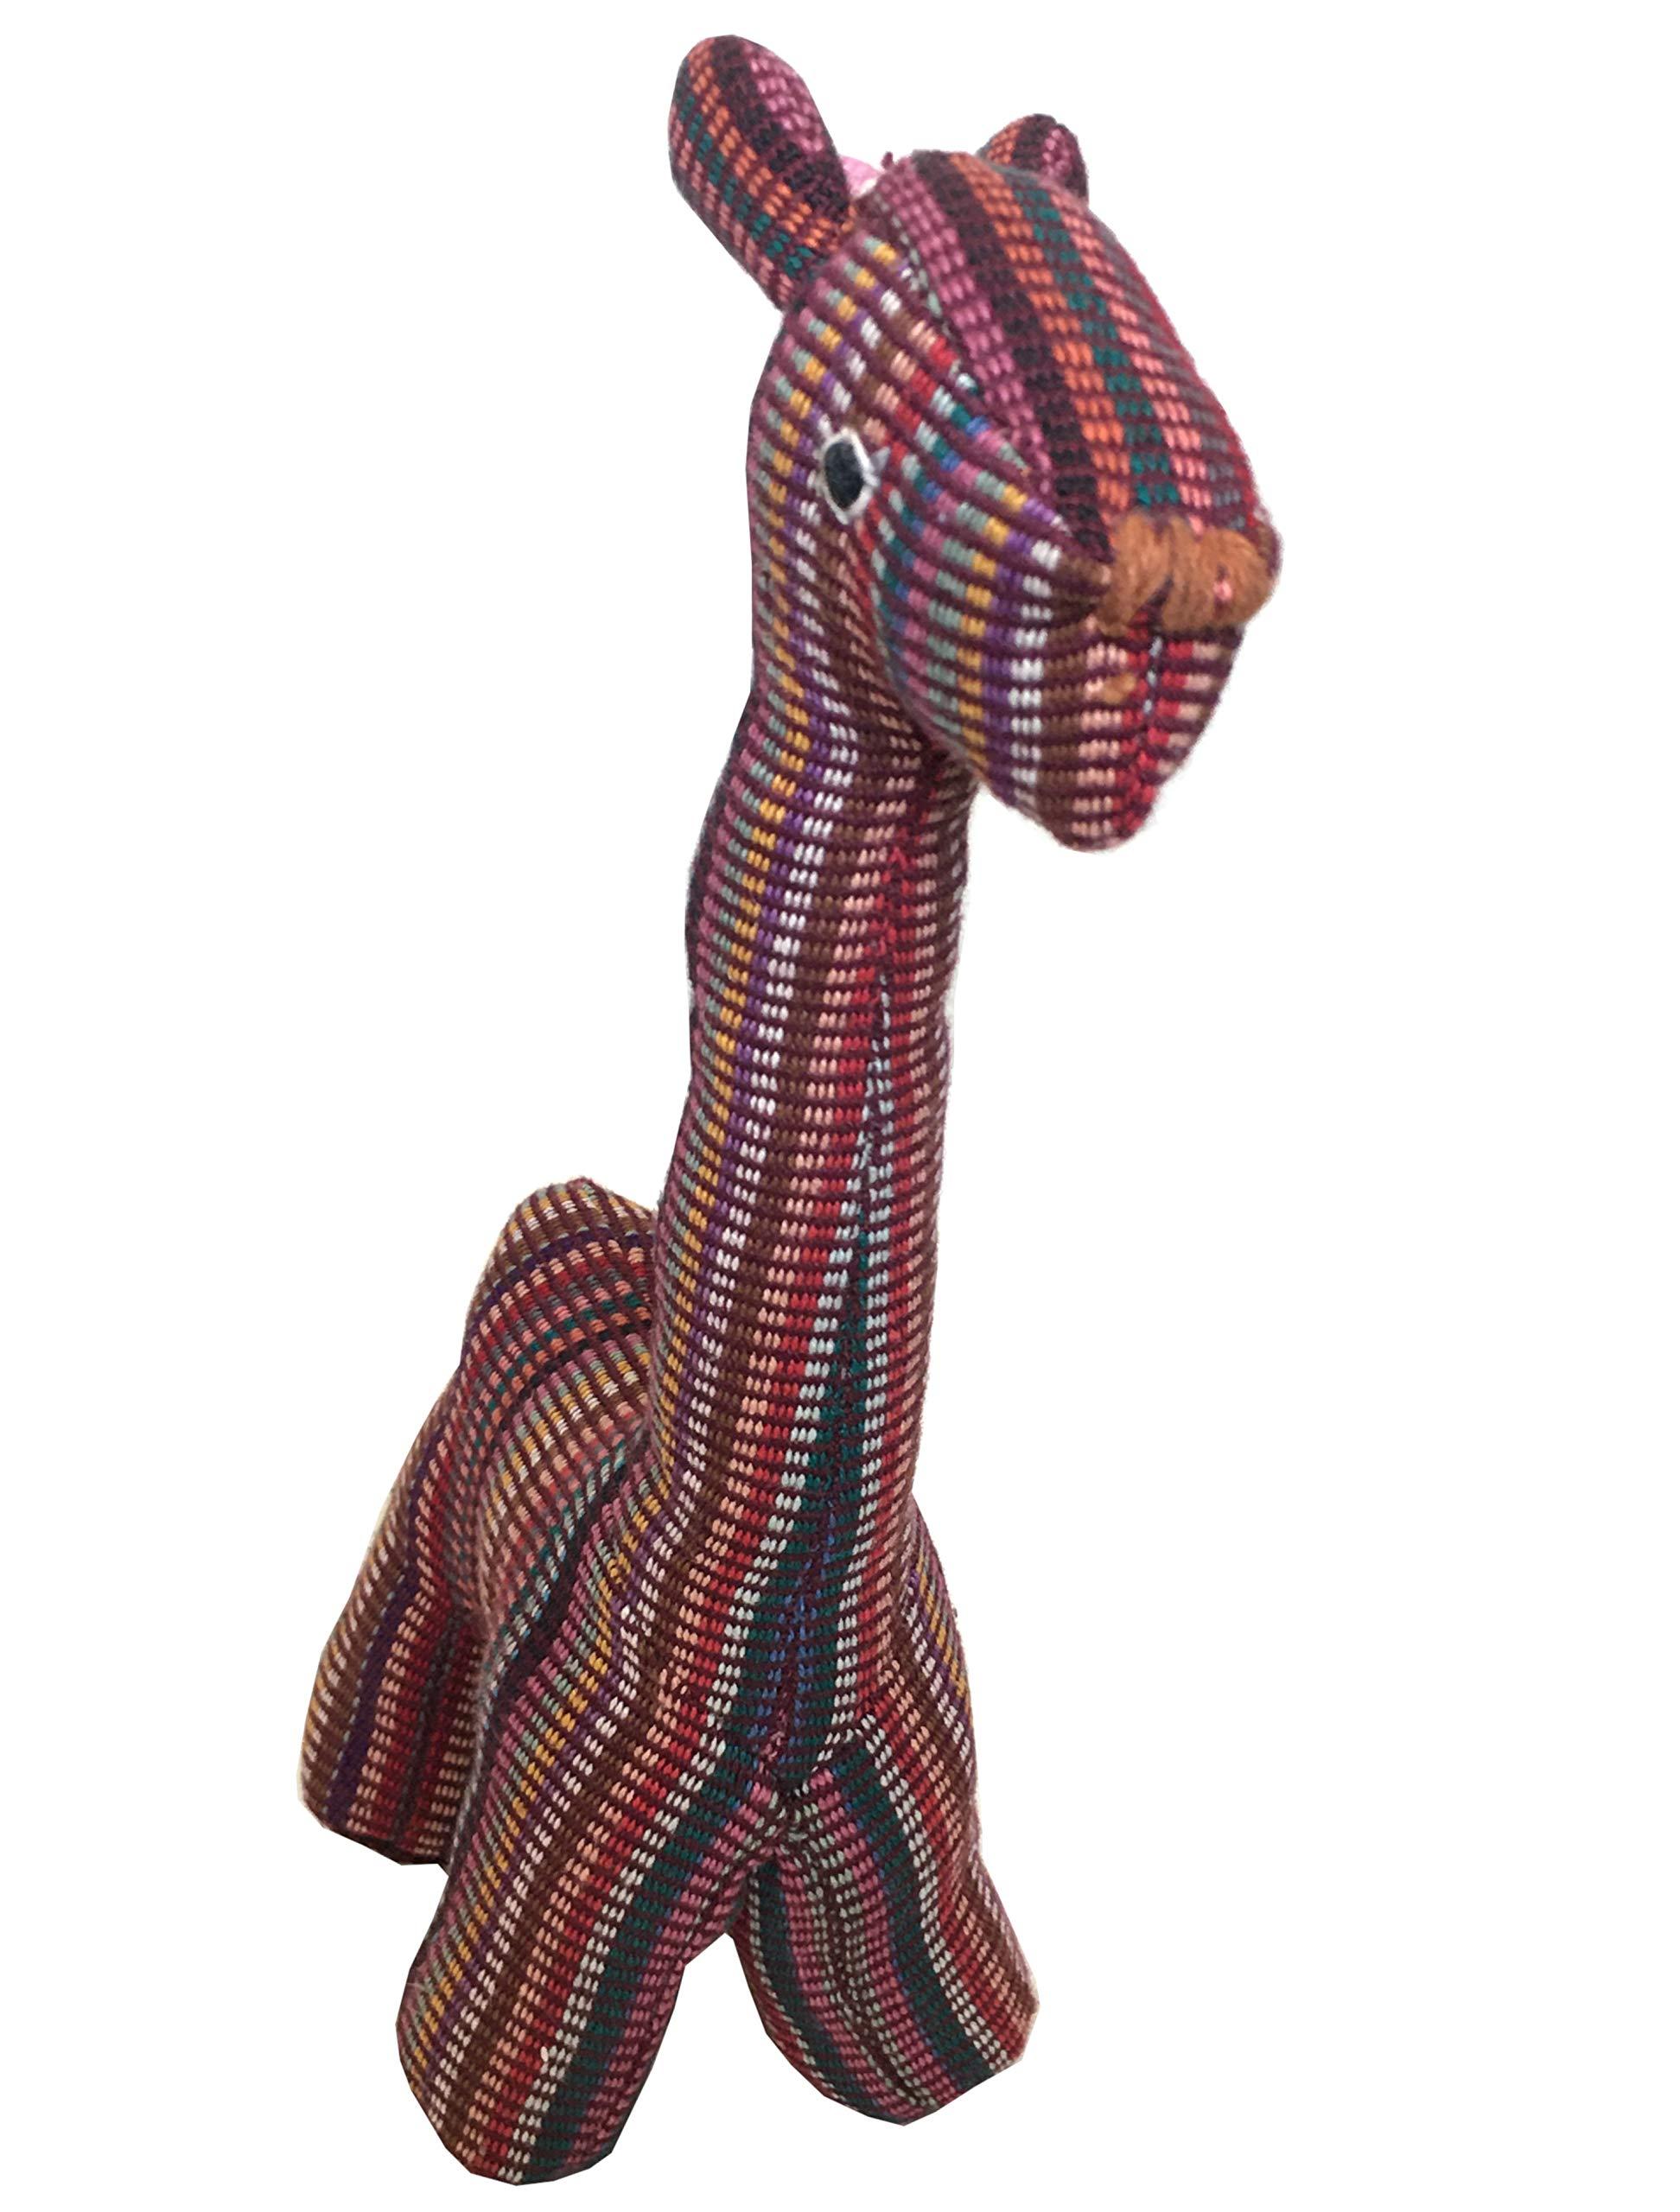 Snow Hill 手工棉羊毛织机玩具,适合狗狗、儿童和小猫,趣味可爱多彩柔软棉和 Allo 羊毛长颈鹿玩偶玩具,独特的 * 纯手工制作天然,适合爱狗人士-(只有一个玩具) 1 Jiraffe 中